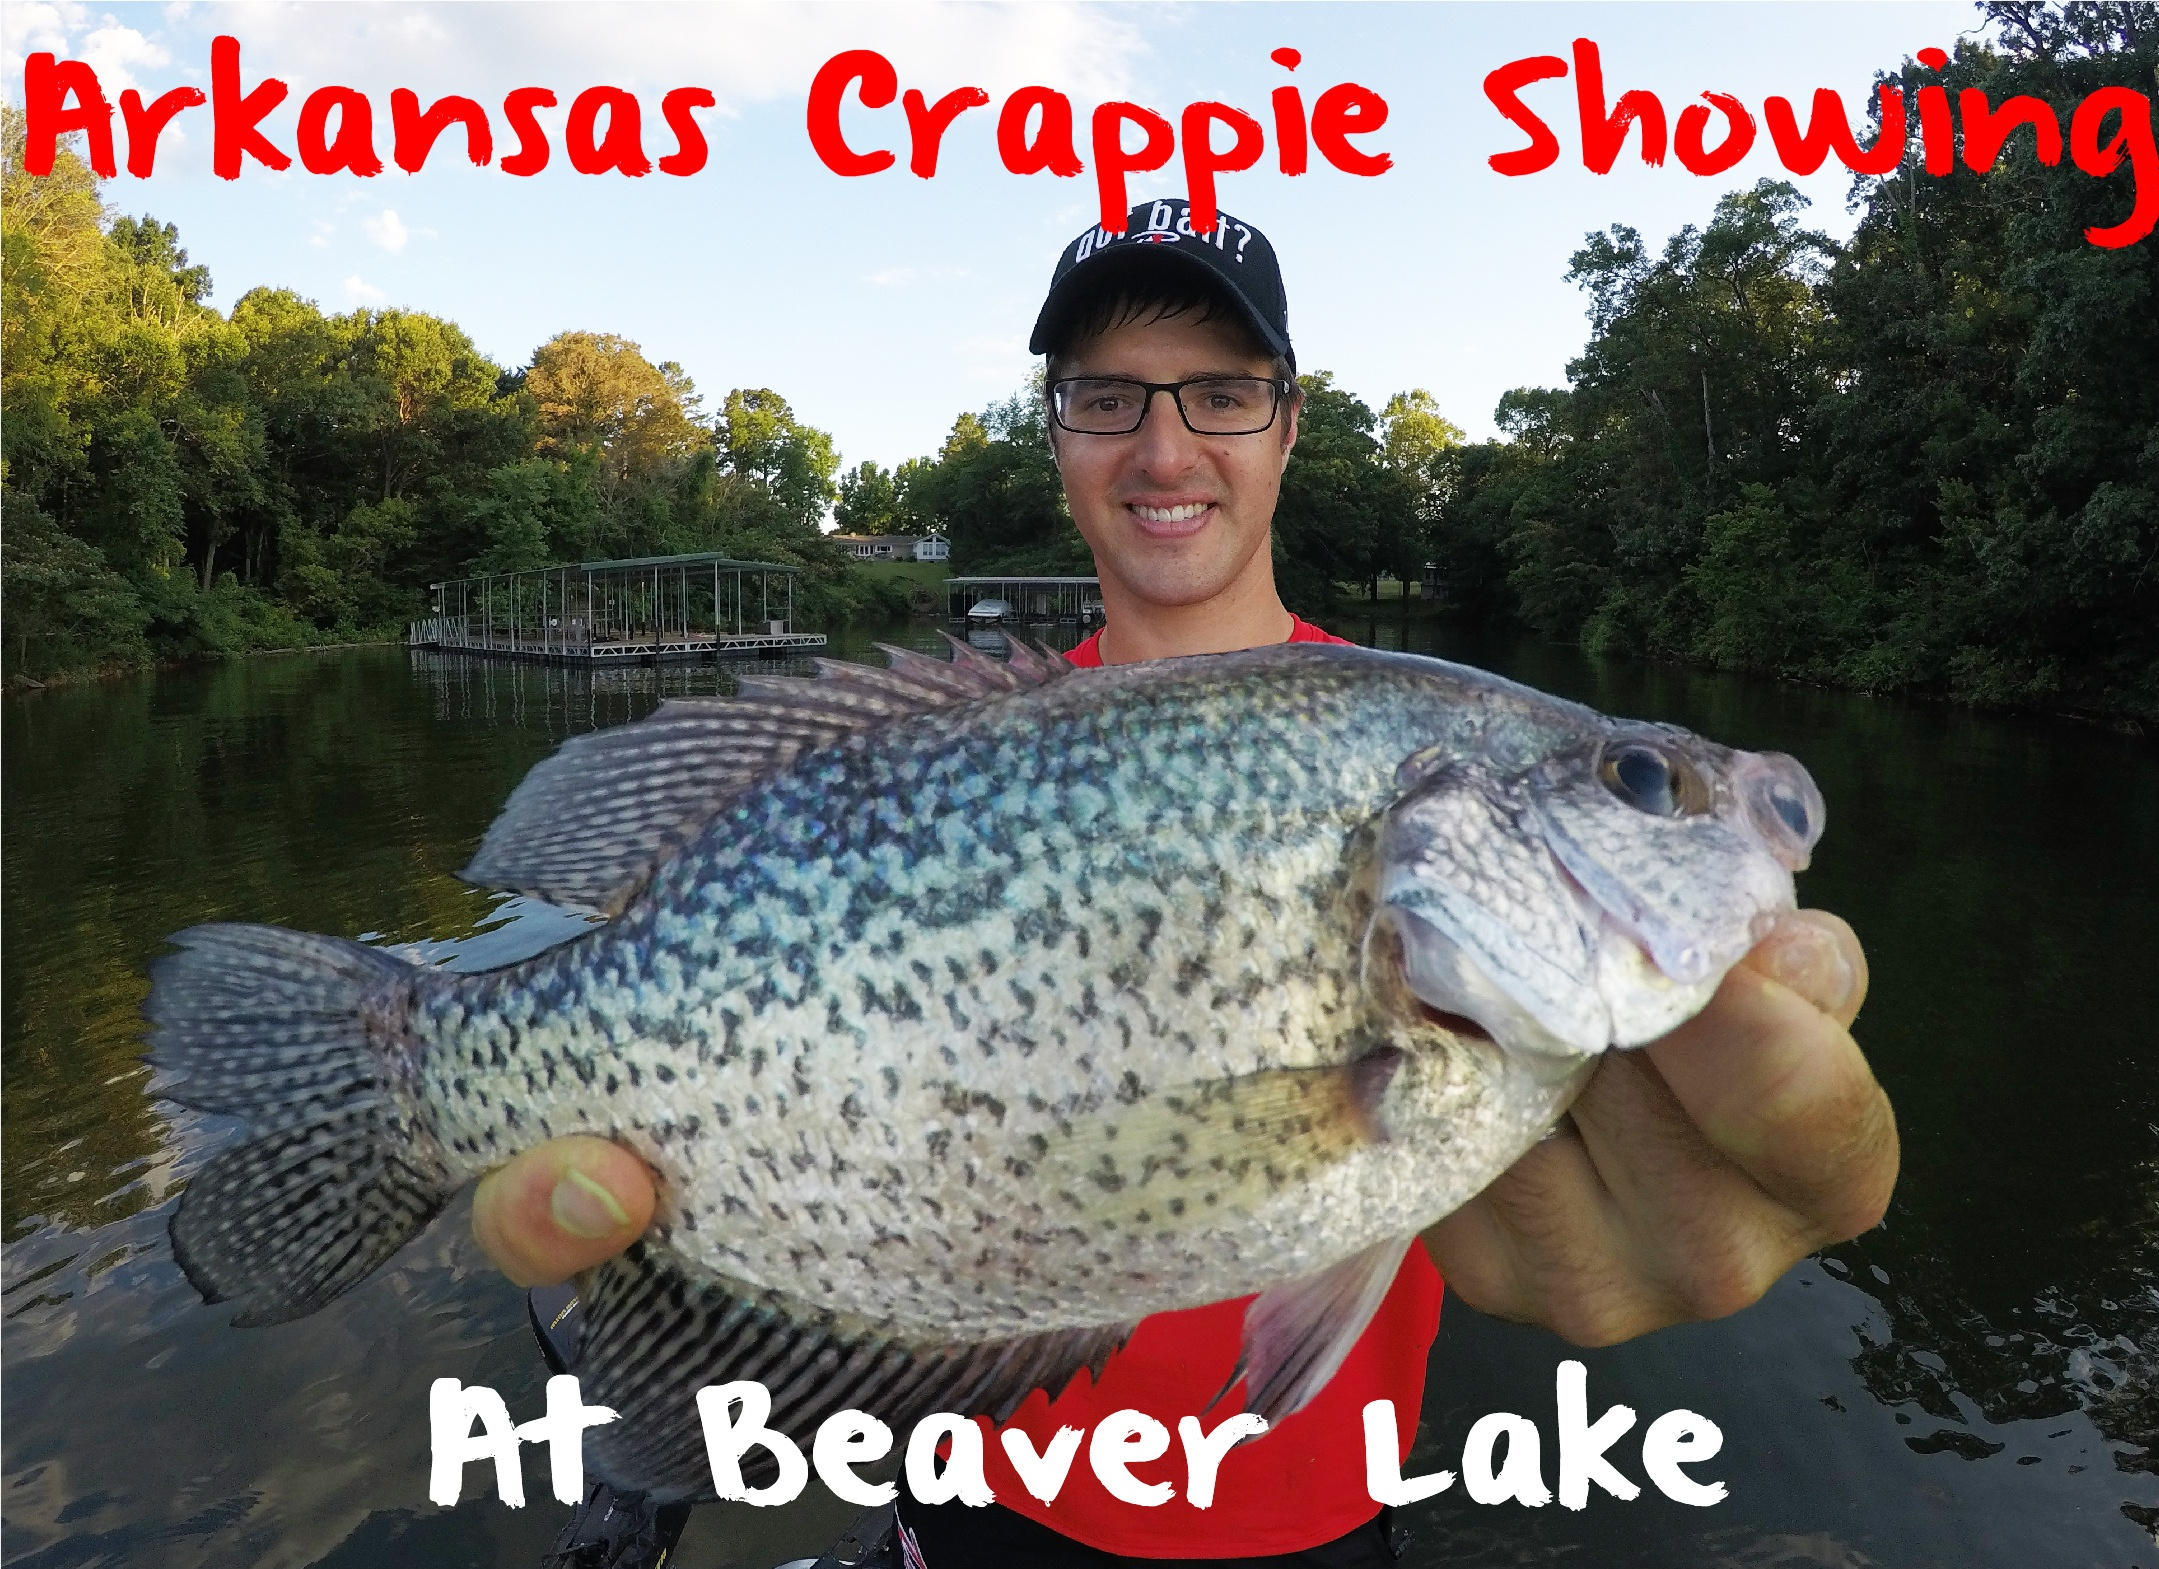 Arkansas crappie showing on beaver lake pautzke bait co for Beaver lake fishing guides